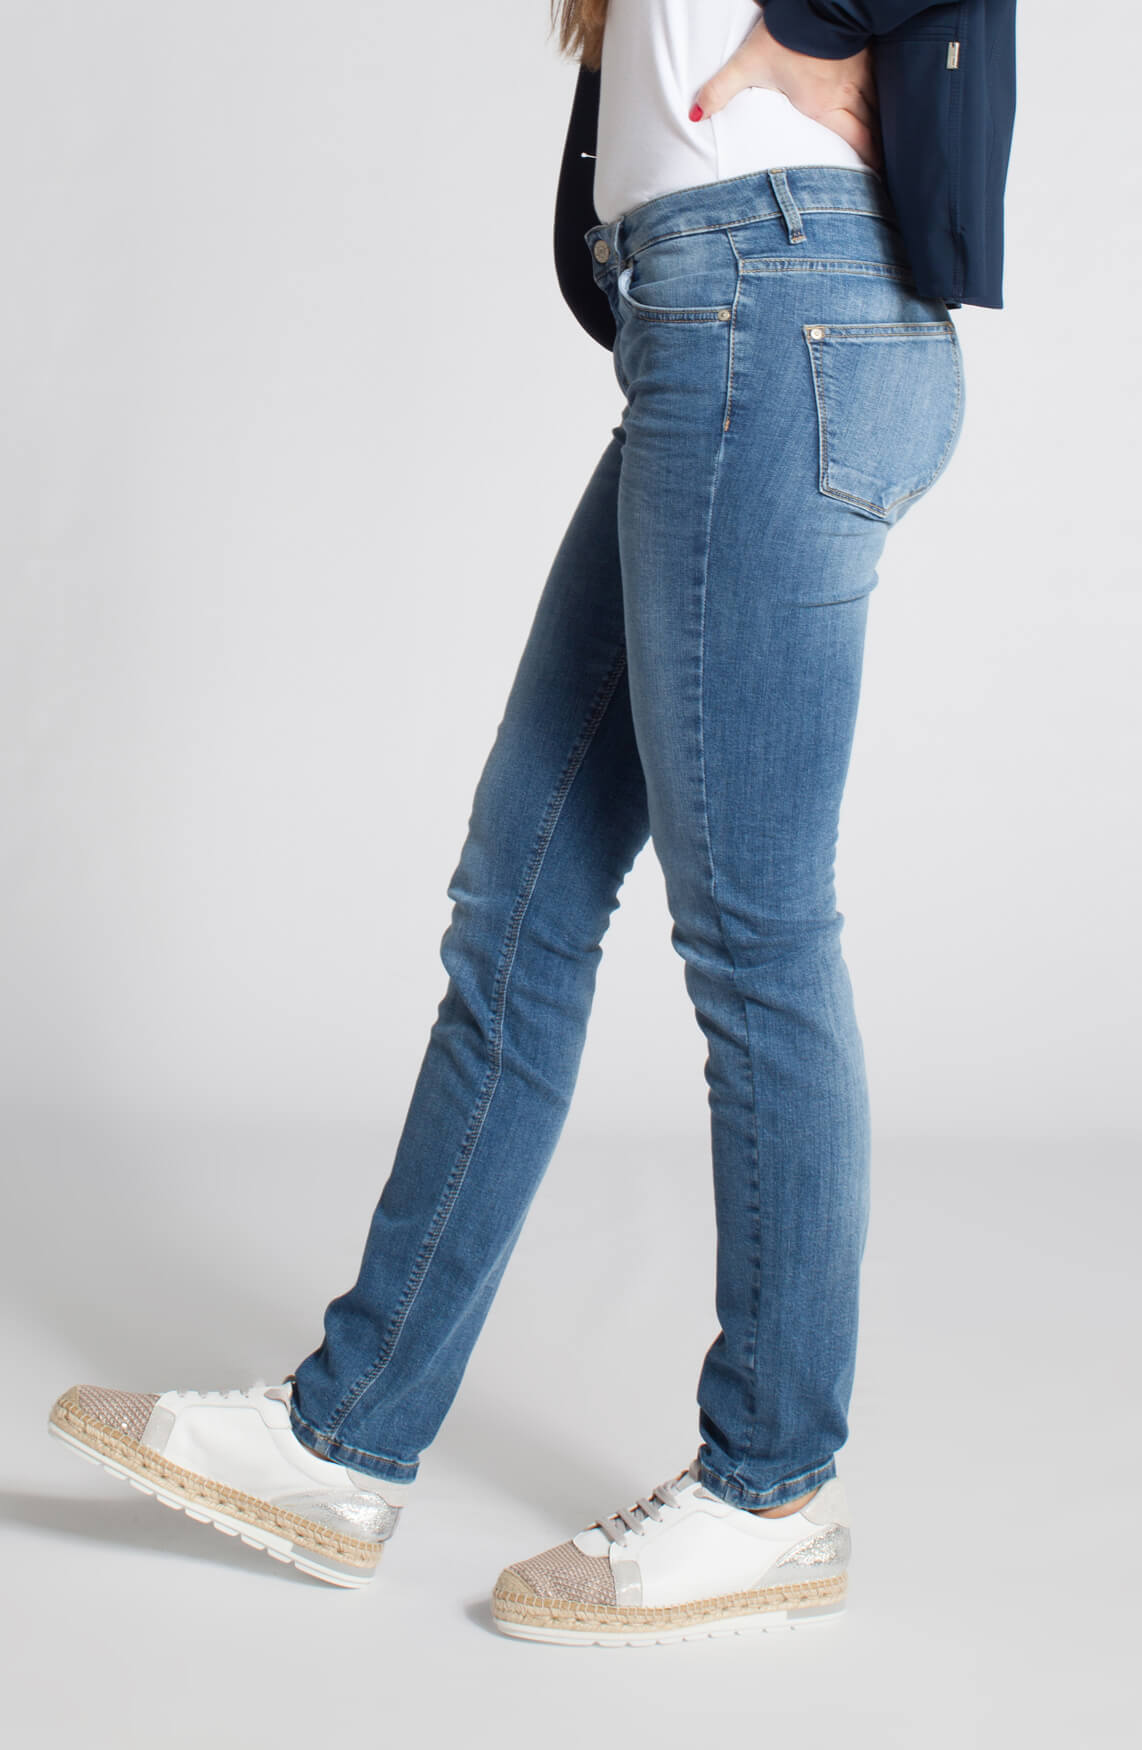 Rosner Dames Recall jeans